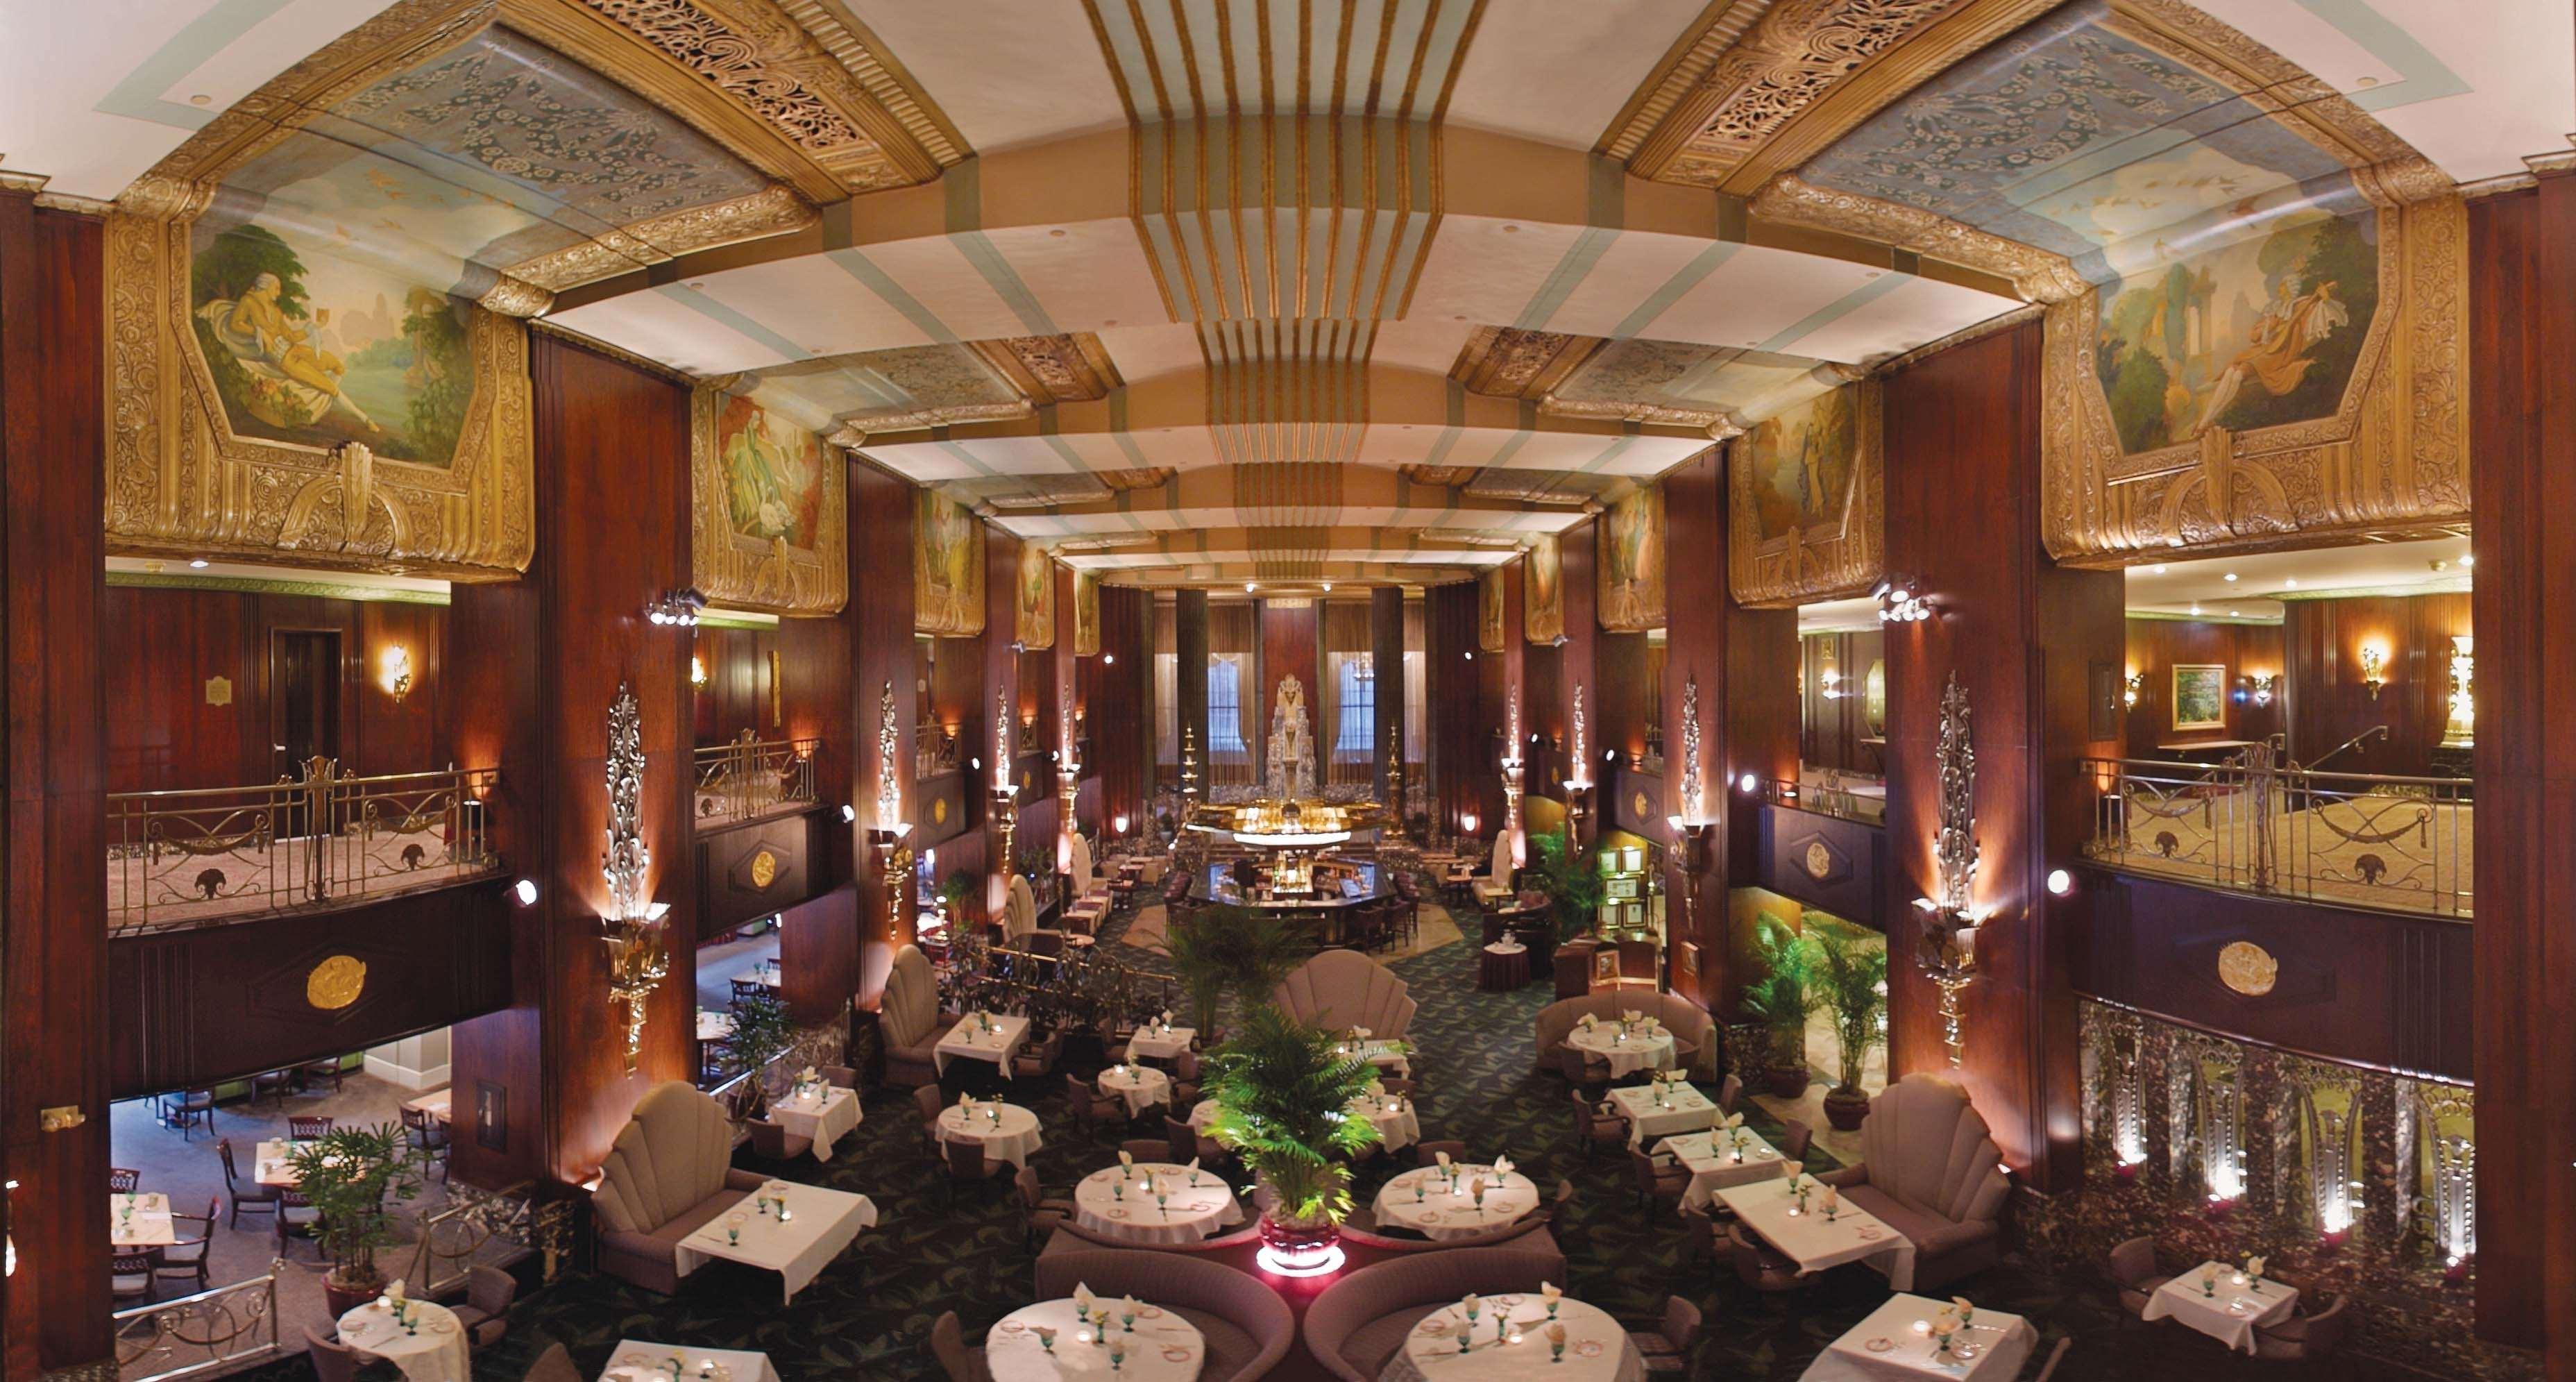 Hilton Cincinnati Netherland Plaza image 2